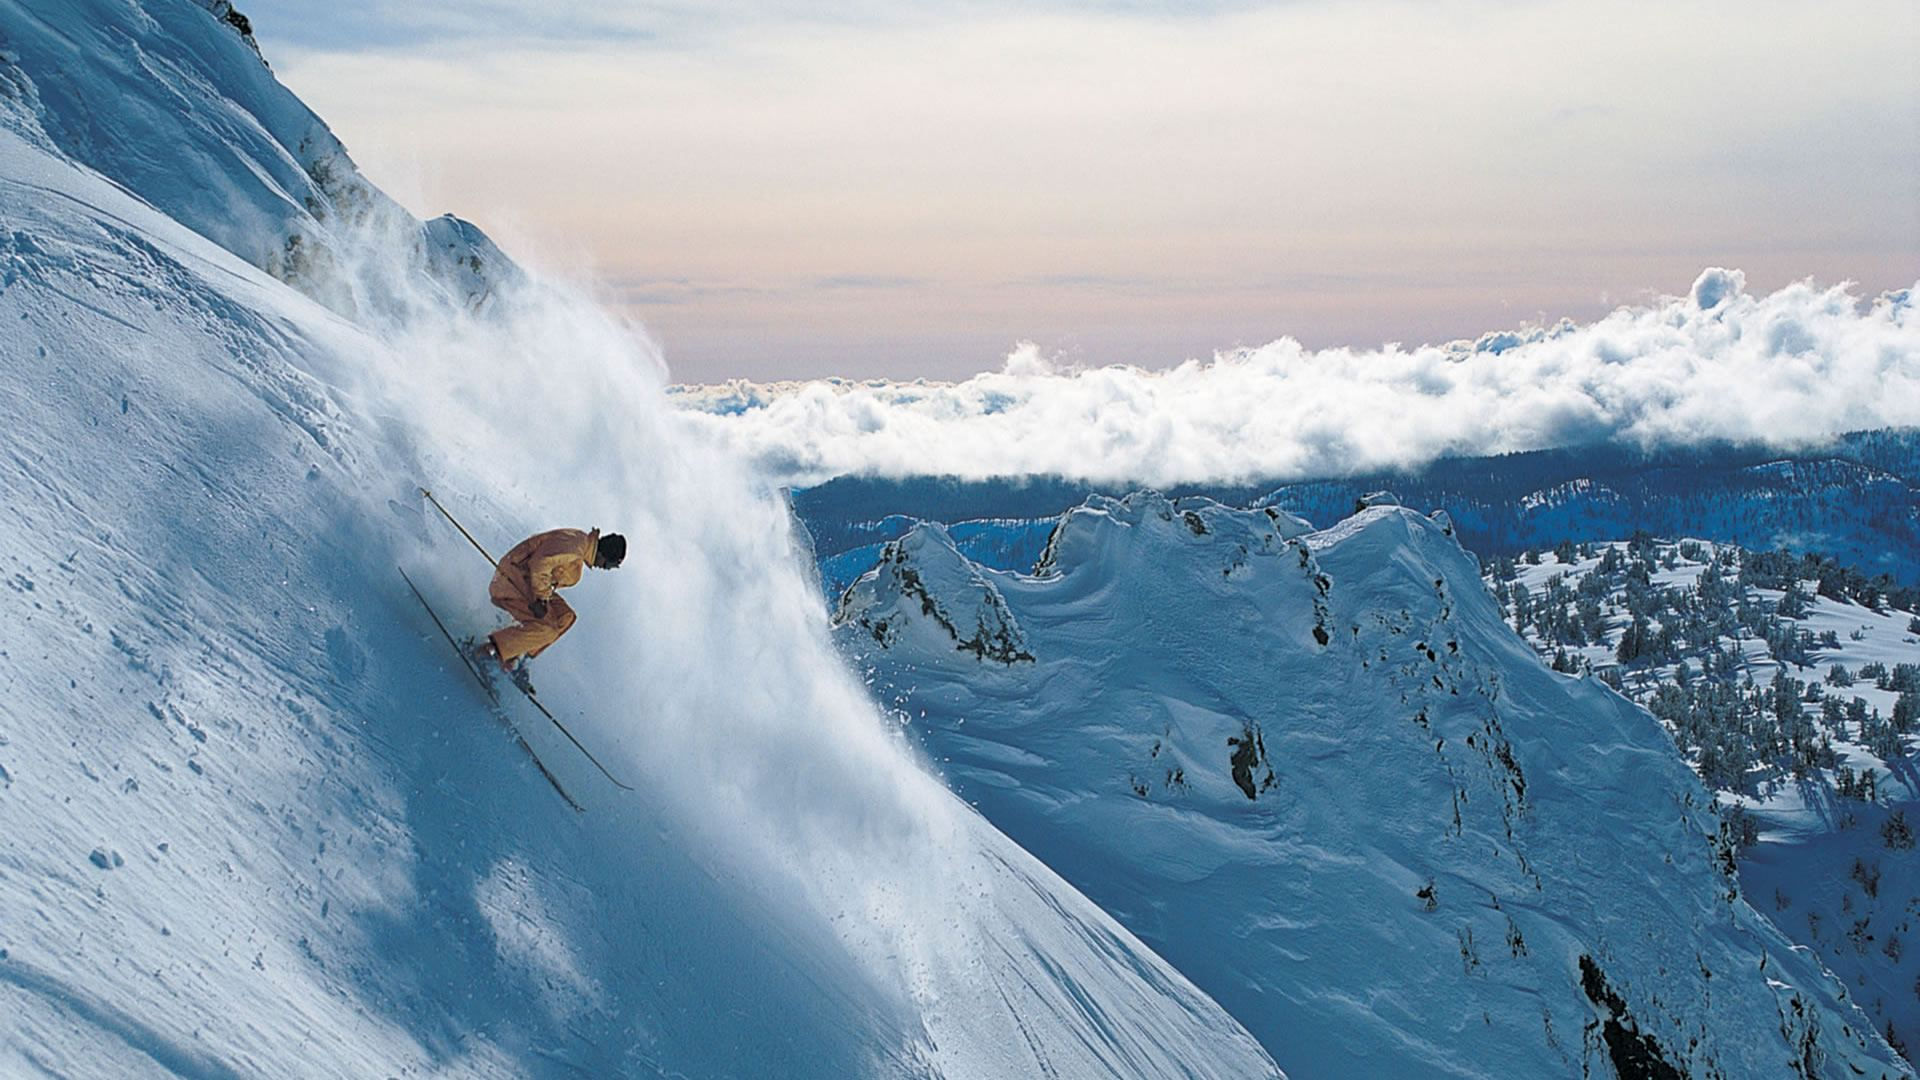 48 powder skiing wallpaper on wallpapersafari - Ski wallpaper ...